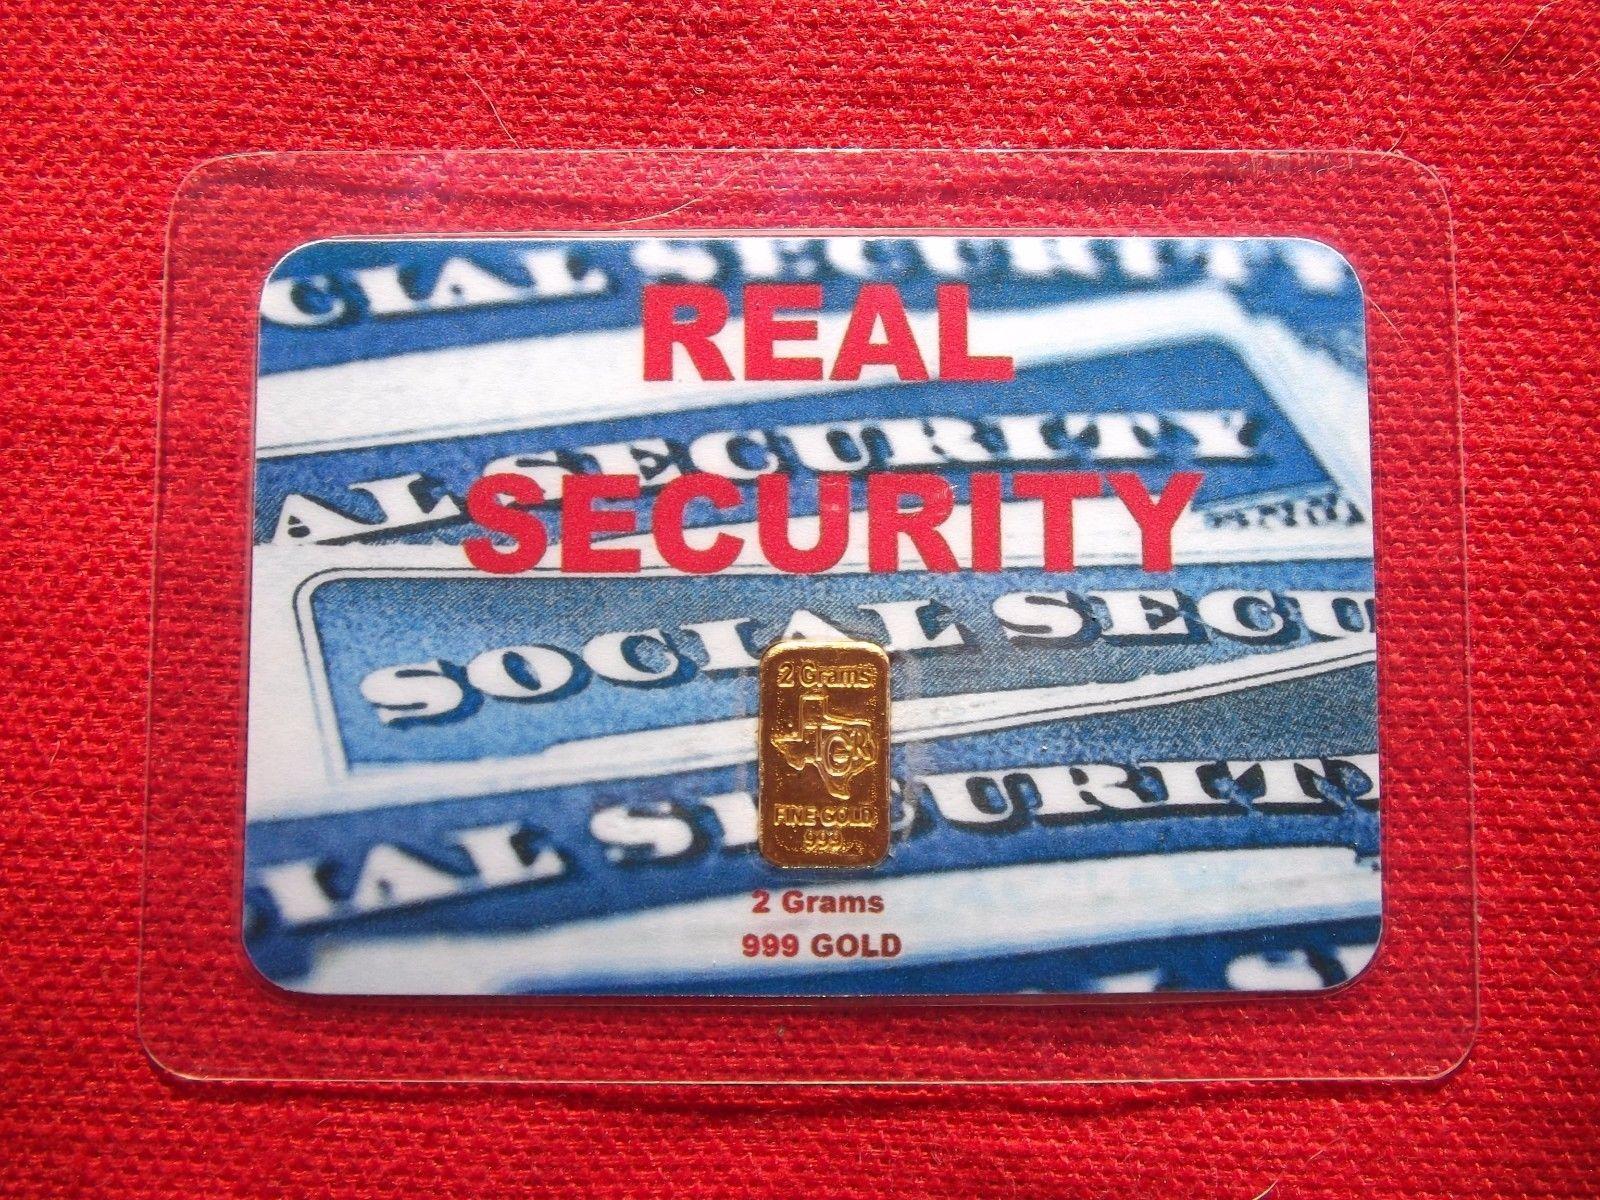 2 gram GOLD TGR BULLION REAL SECURITY EDITION 999 Bar Sealed In Assay card L@@K.